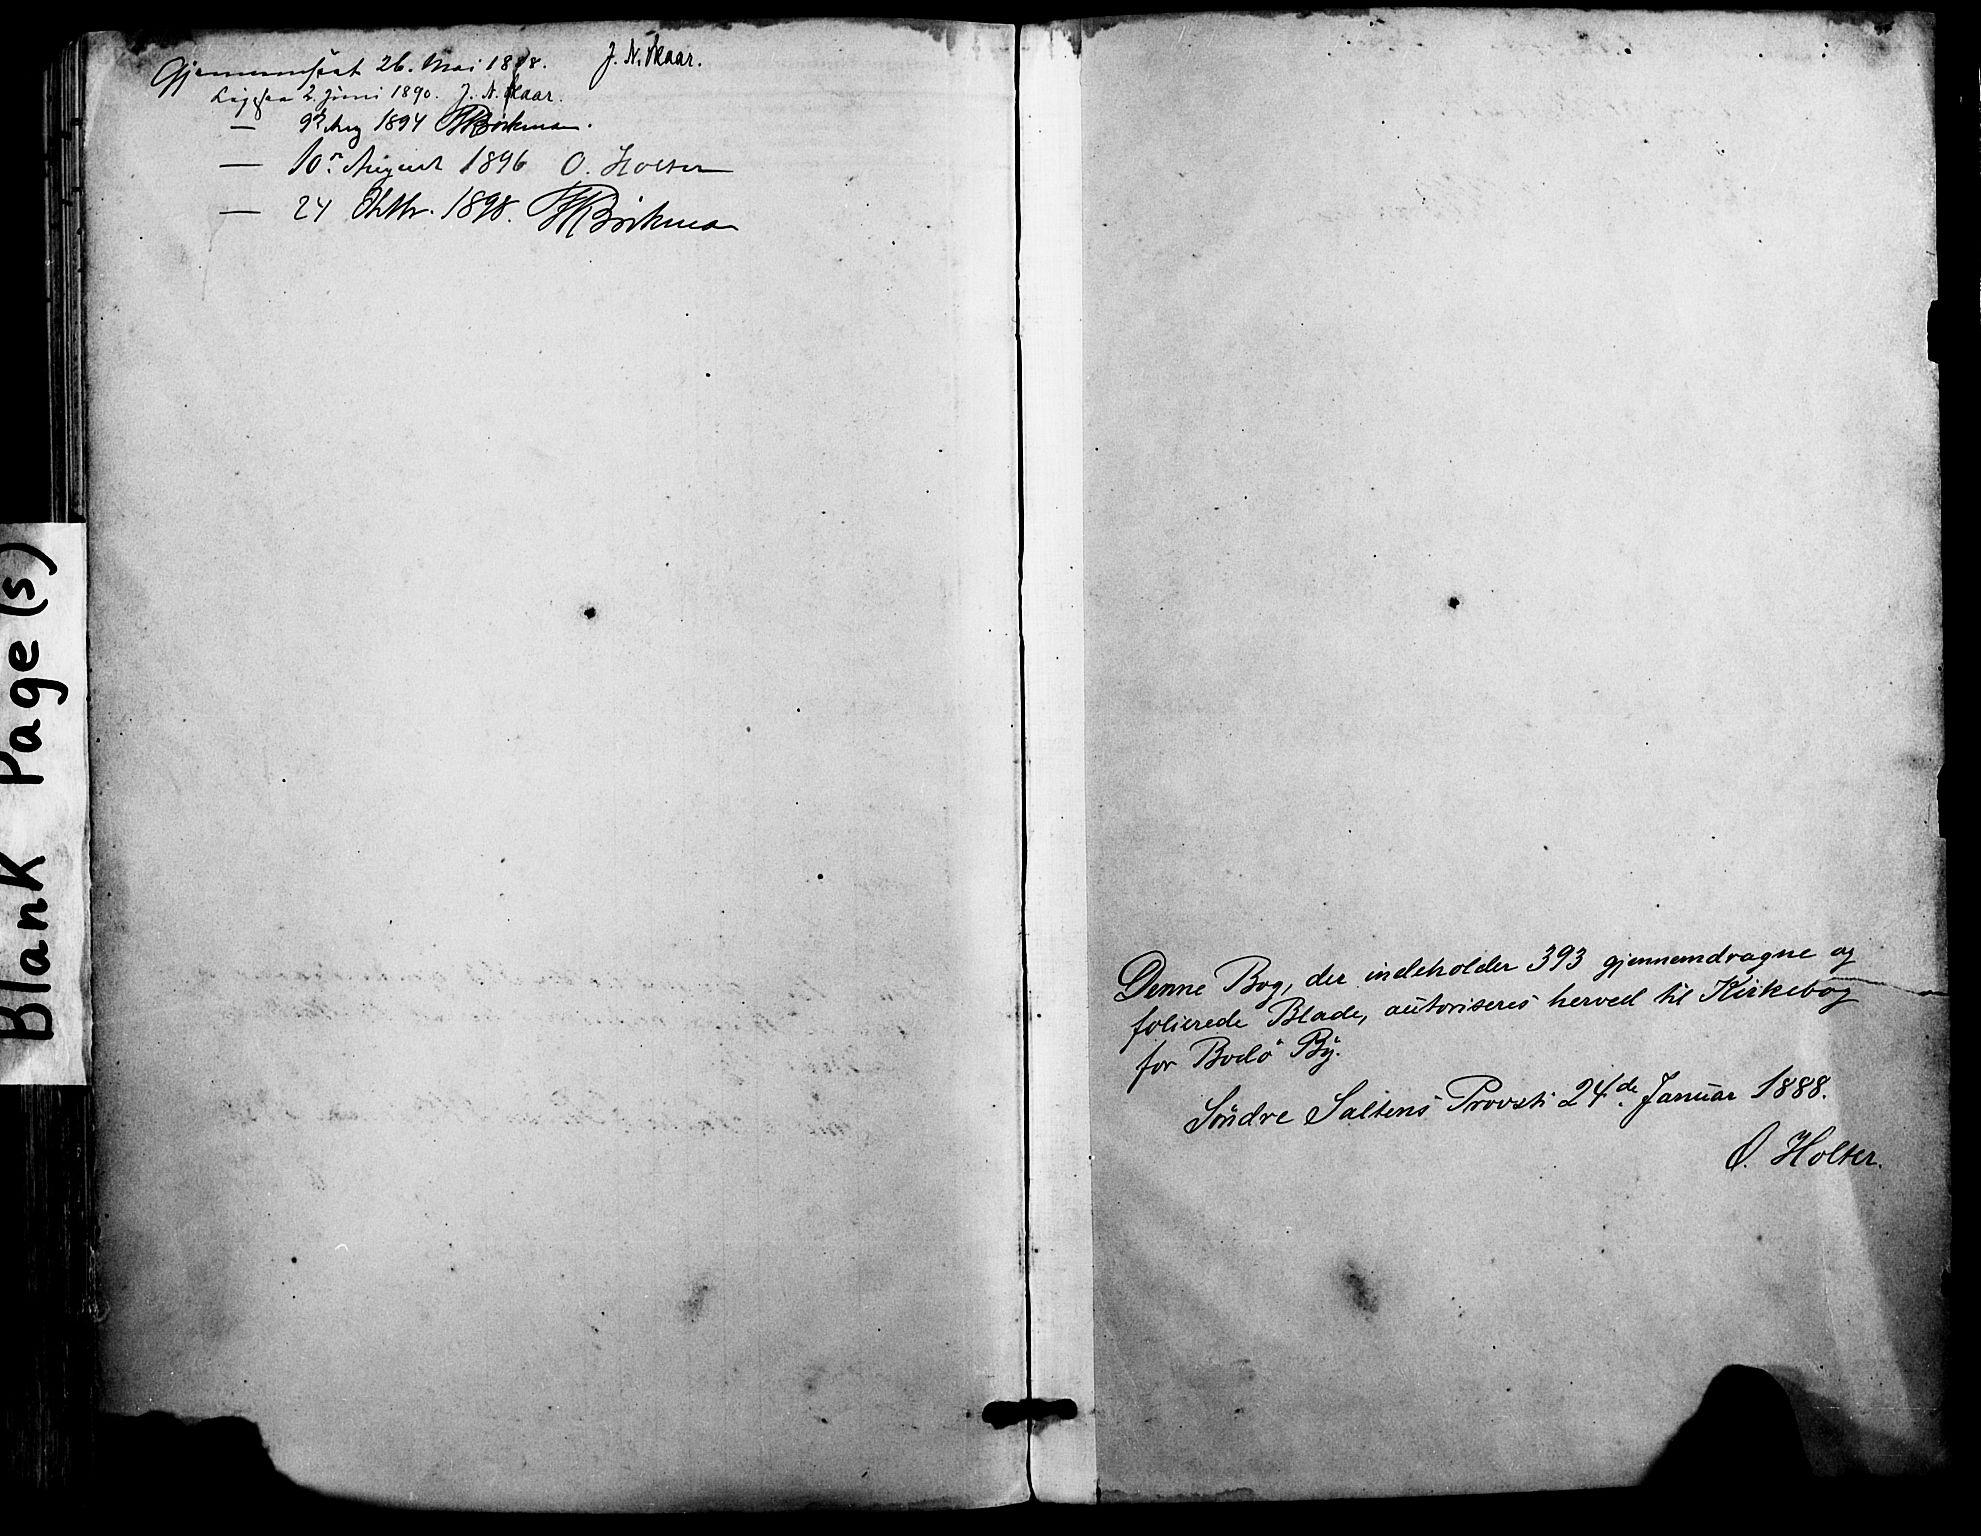 SAT, Ministerialprotokoller, klokkerbøker og fødselsregistre - Nordland, 801/L0010: Ministerialbok nr. 801A10, 1888-1899